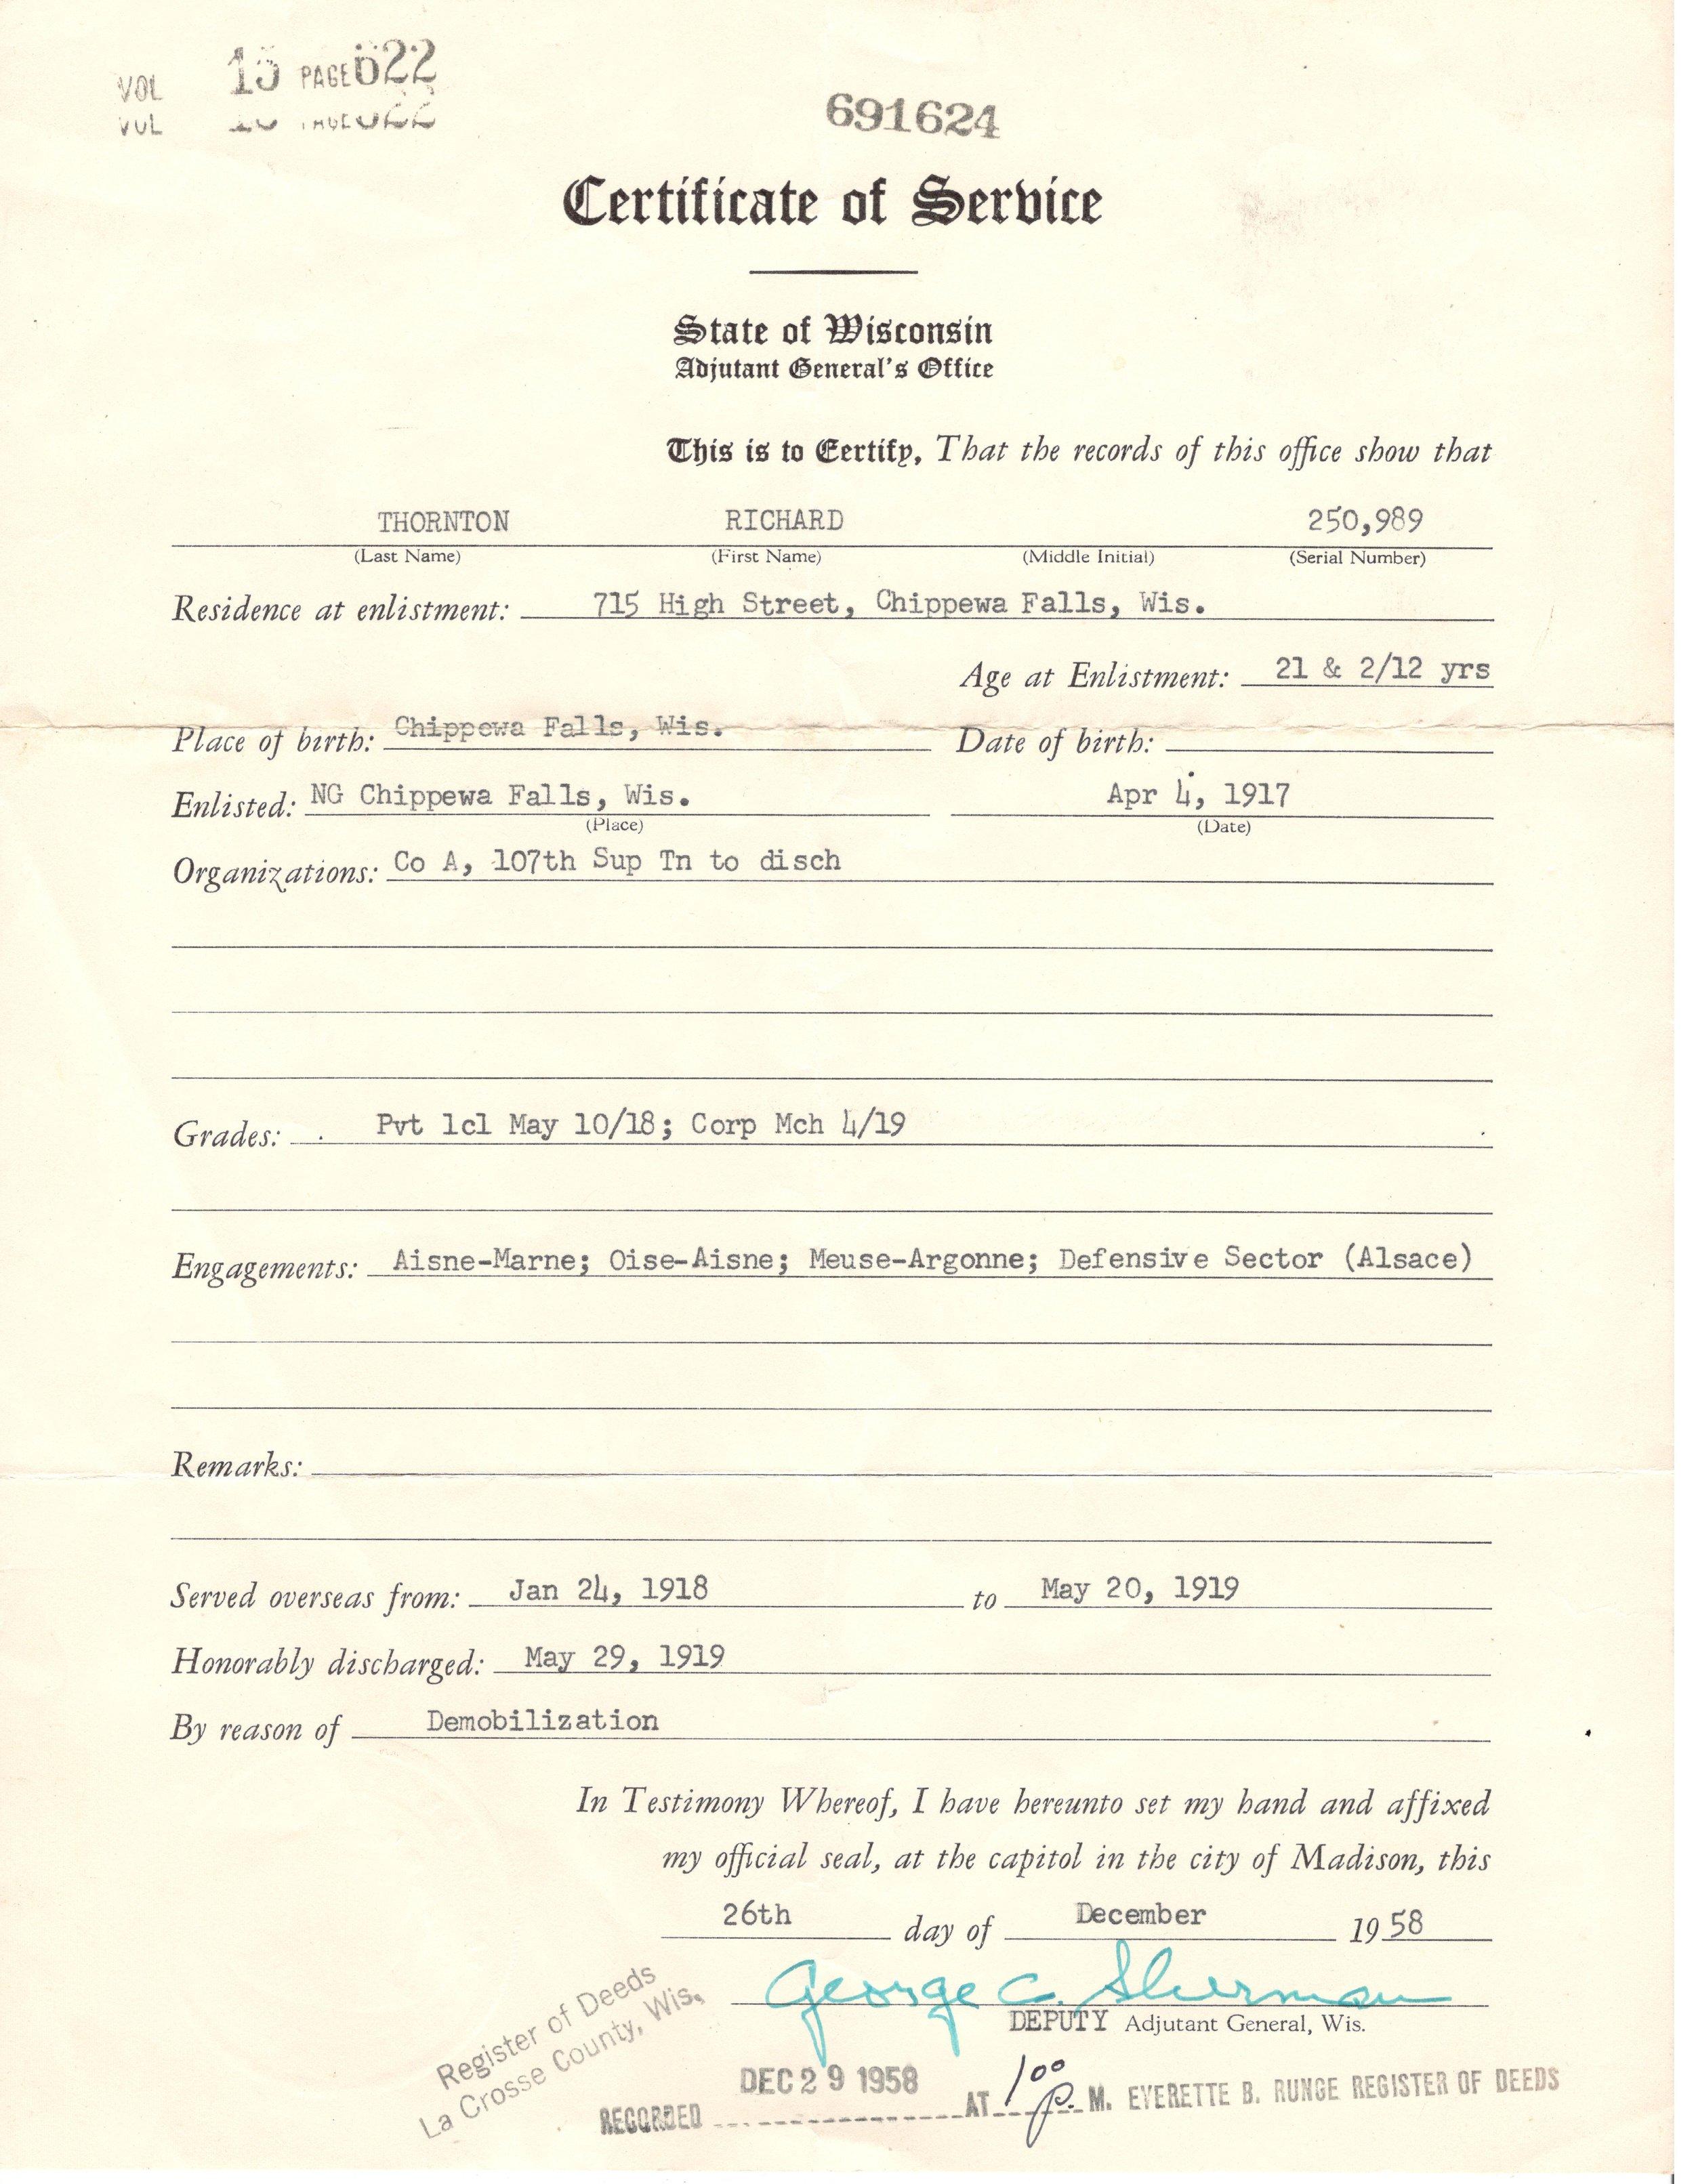 Richard's Certificate of Service.